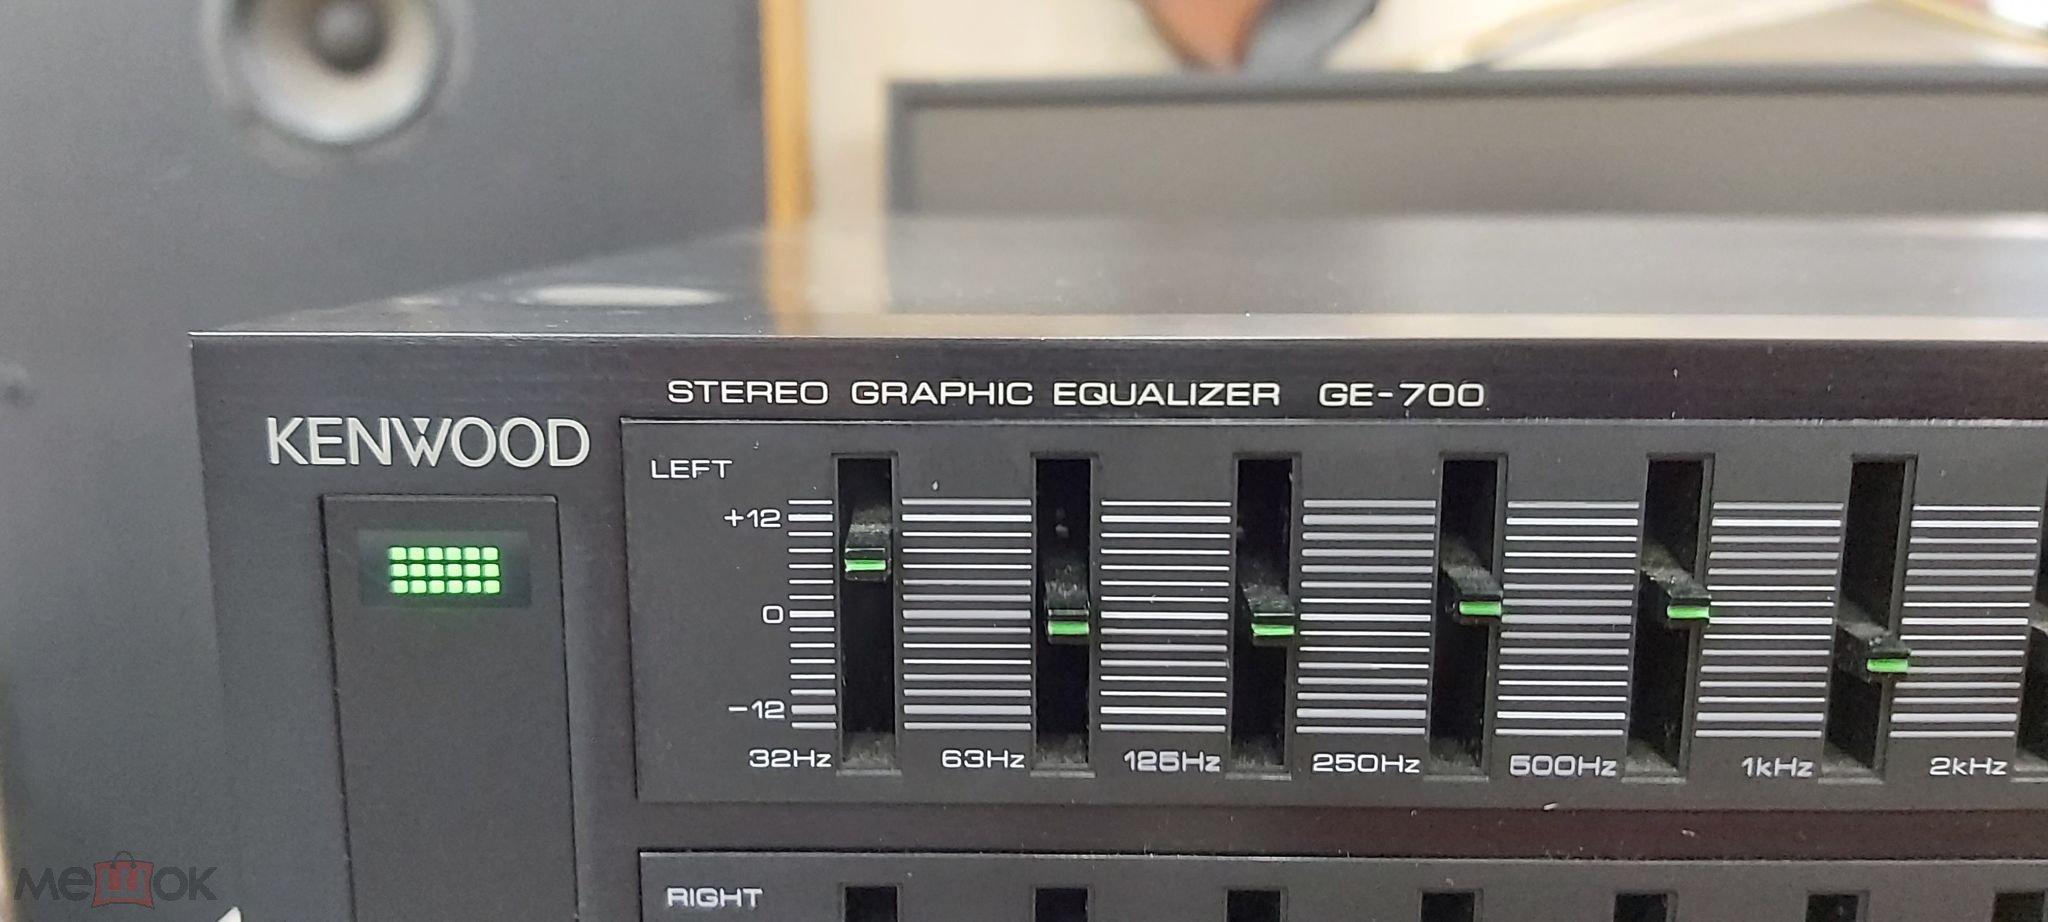 KENWOOD GE-700 эквалайзер графический, с анализатором спектра, очень красиво. Япония. От 1 рубля.